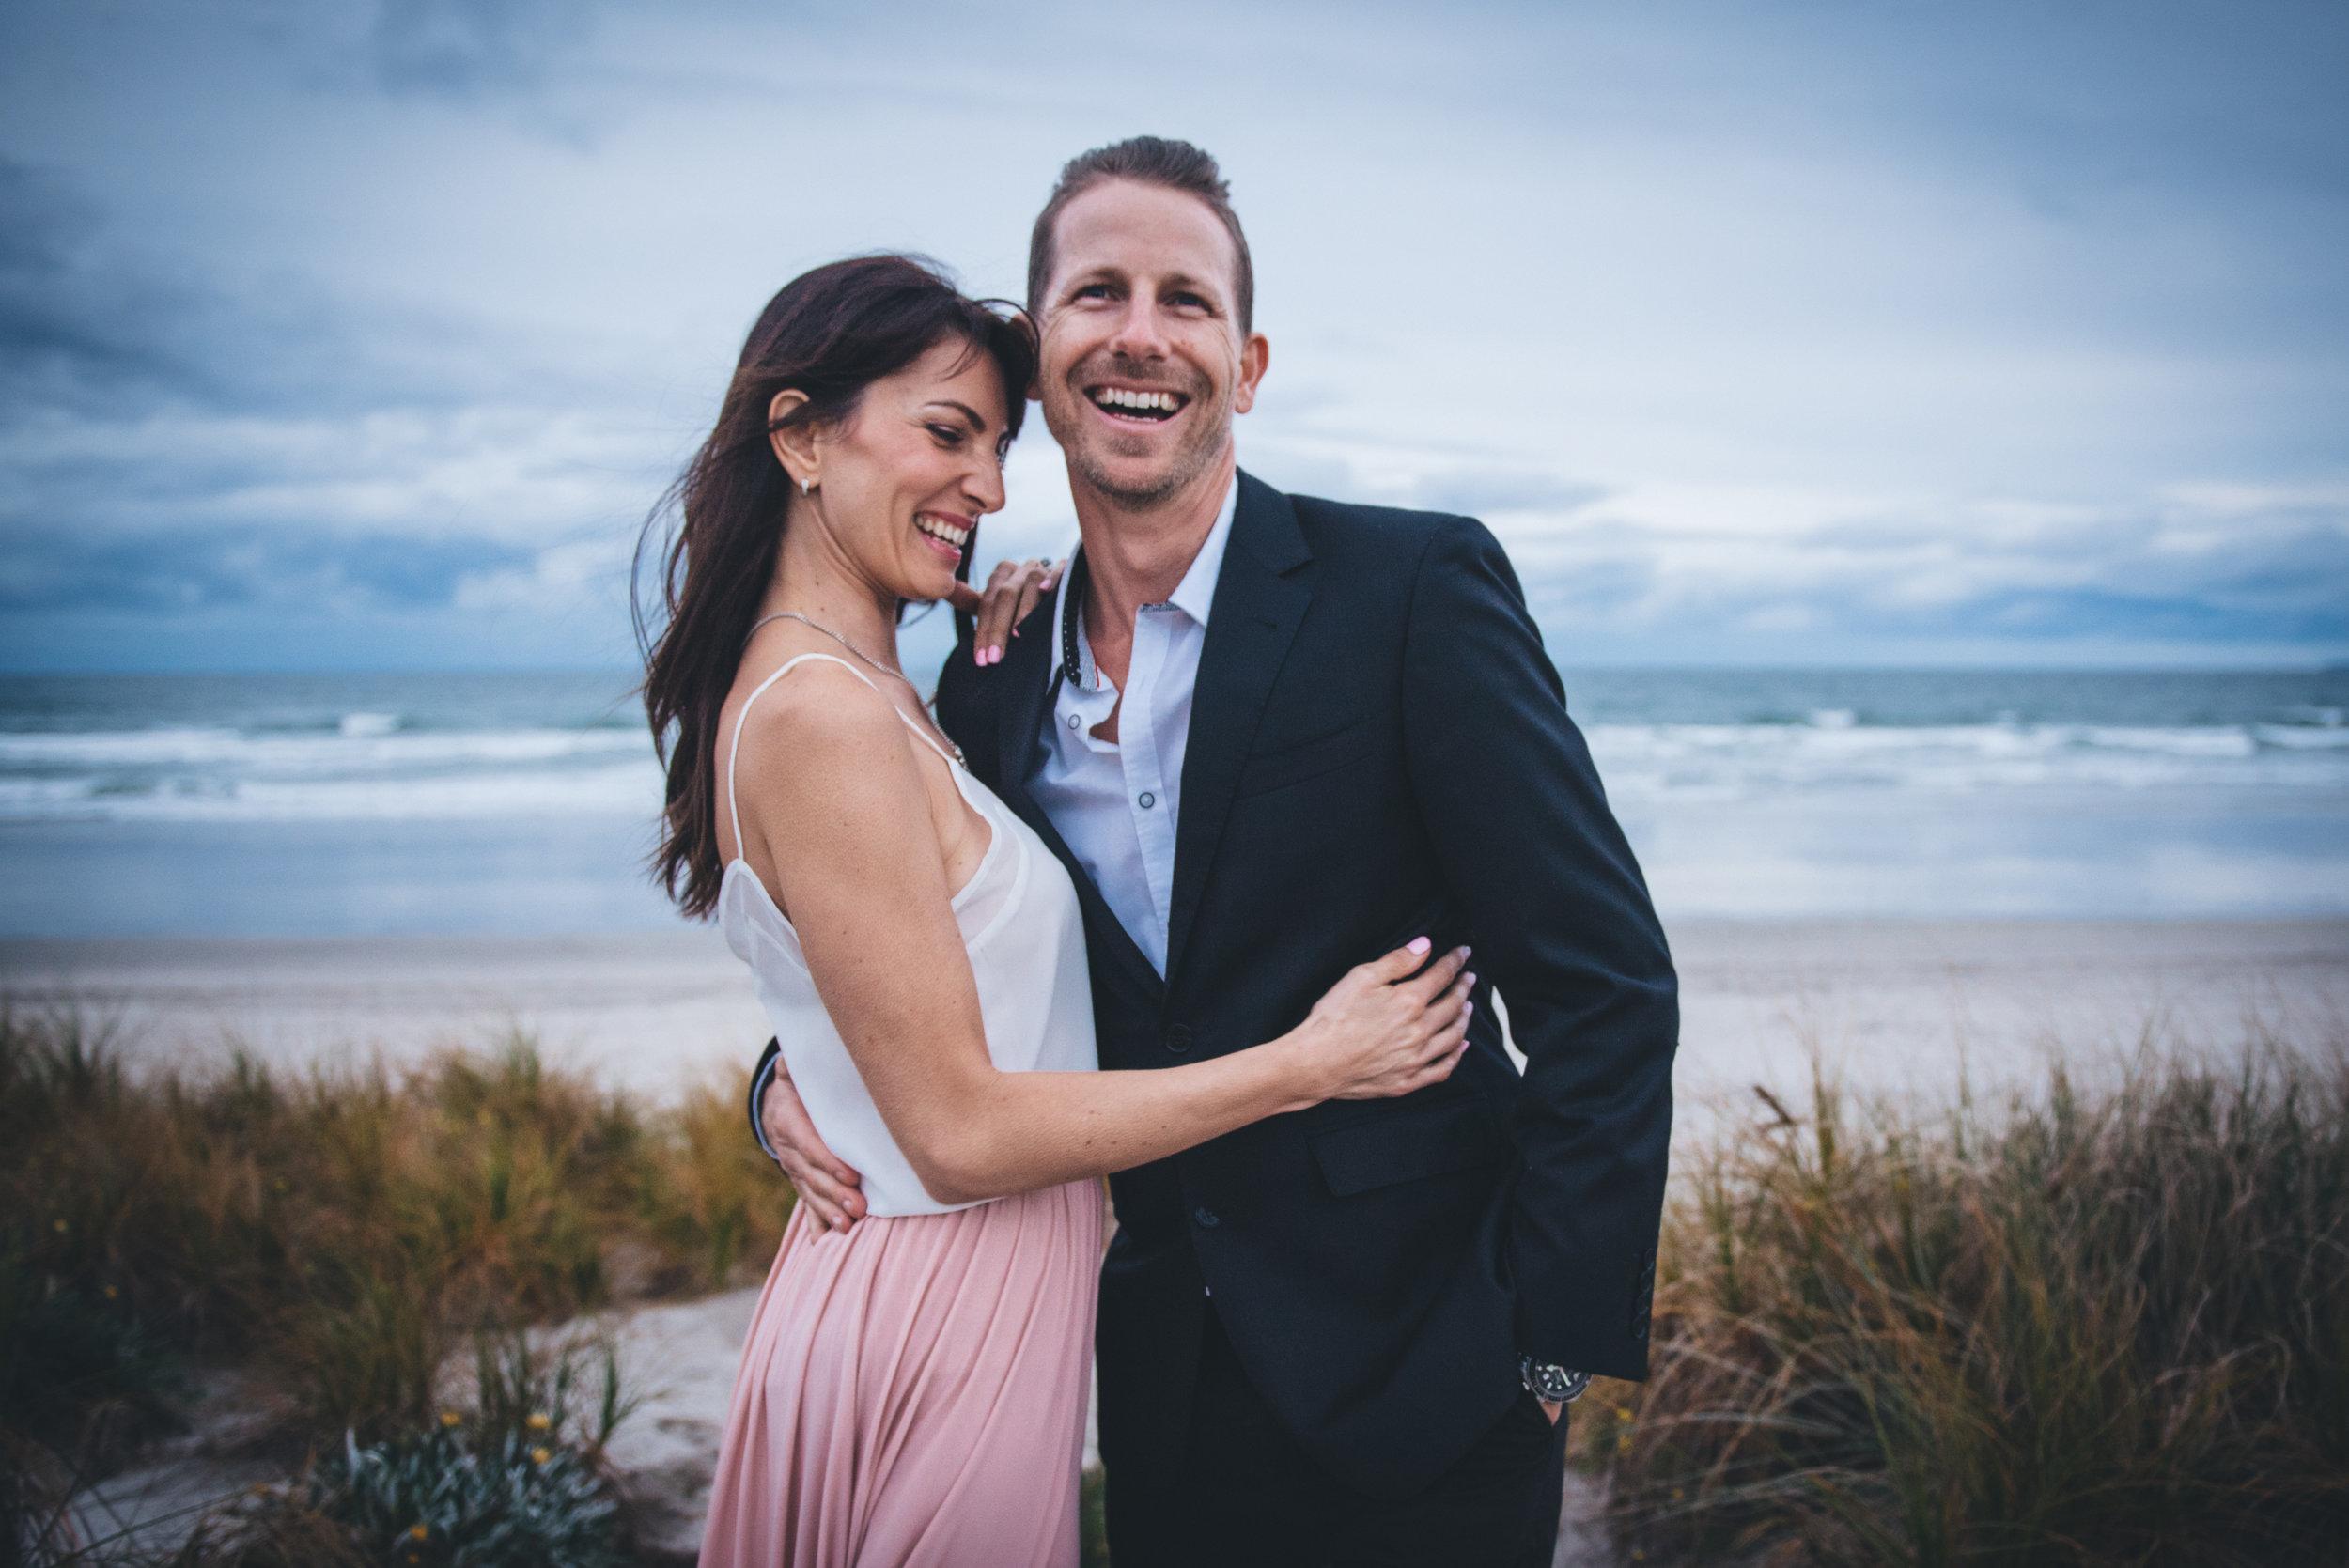 Auckland wedding photographer, award winning wedding photographer, engagement photographer